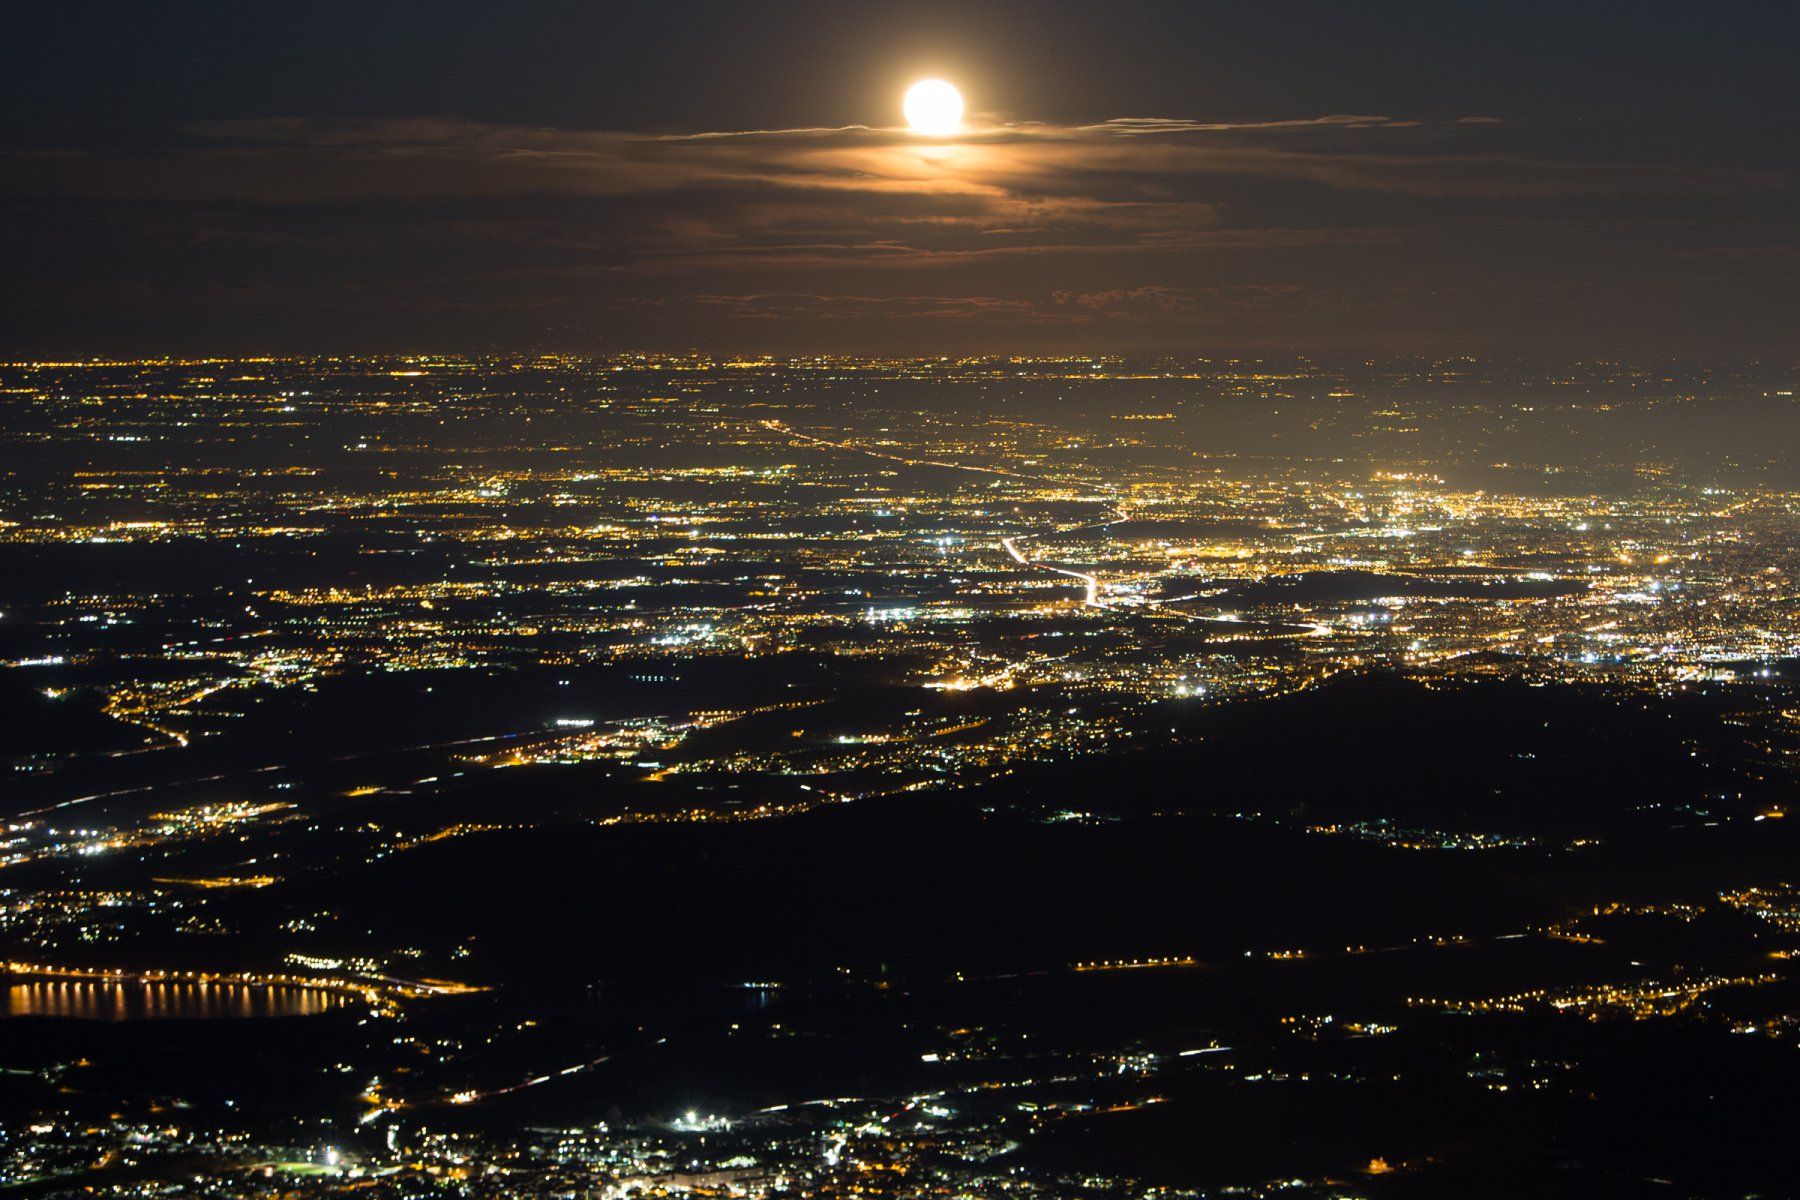 Meravigliosa luna